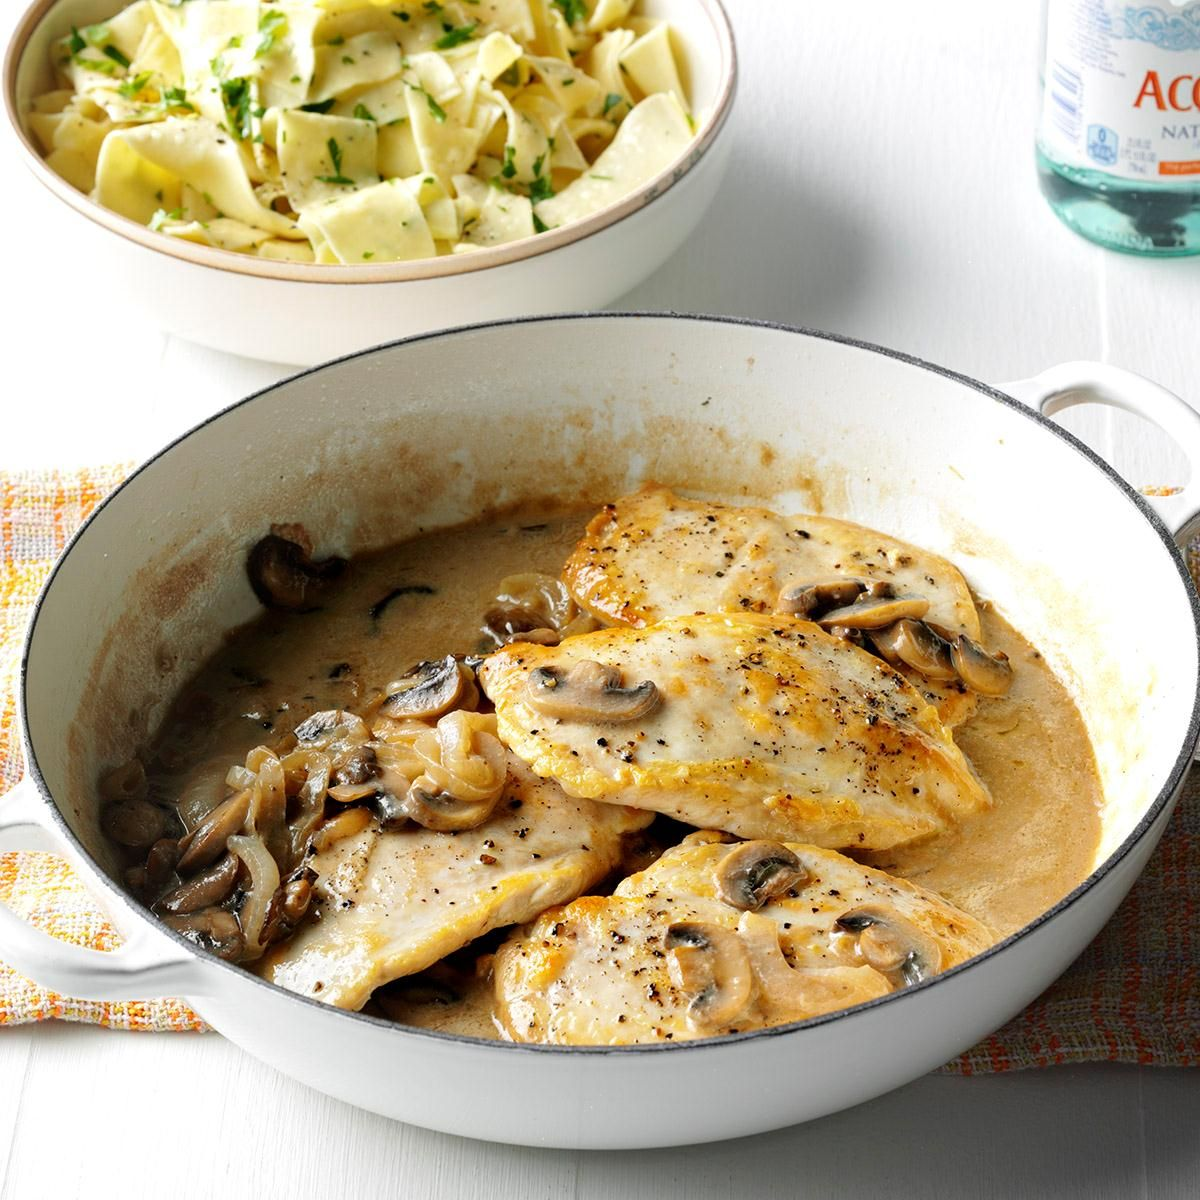 35 Mouthwatering Mushroom Recipes: Contest-Winning Chicken With Mushroom Sauce